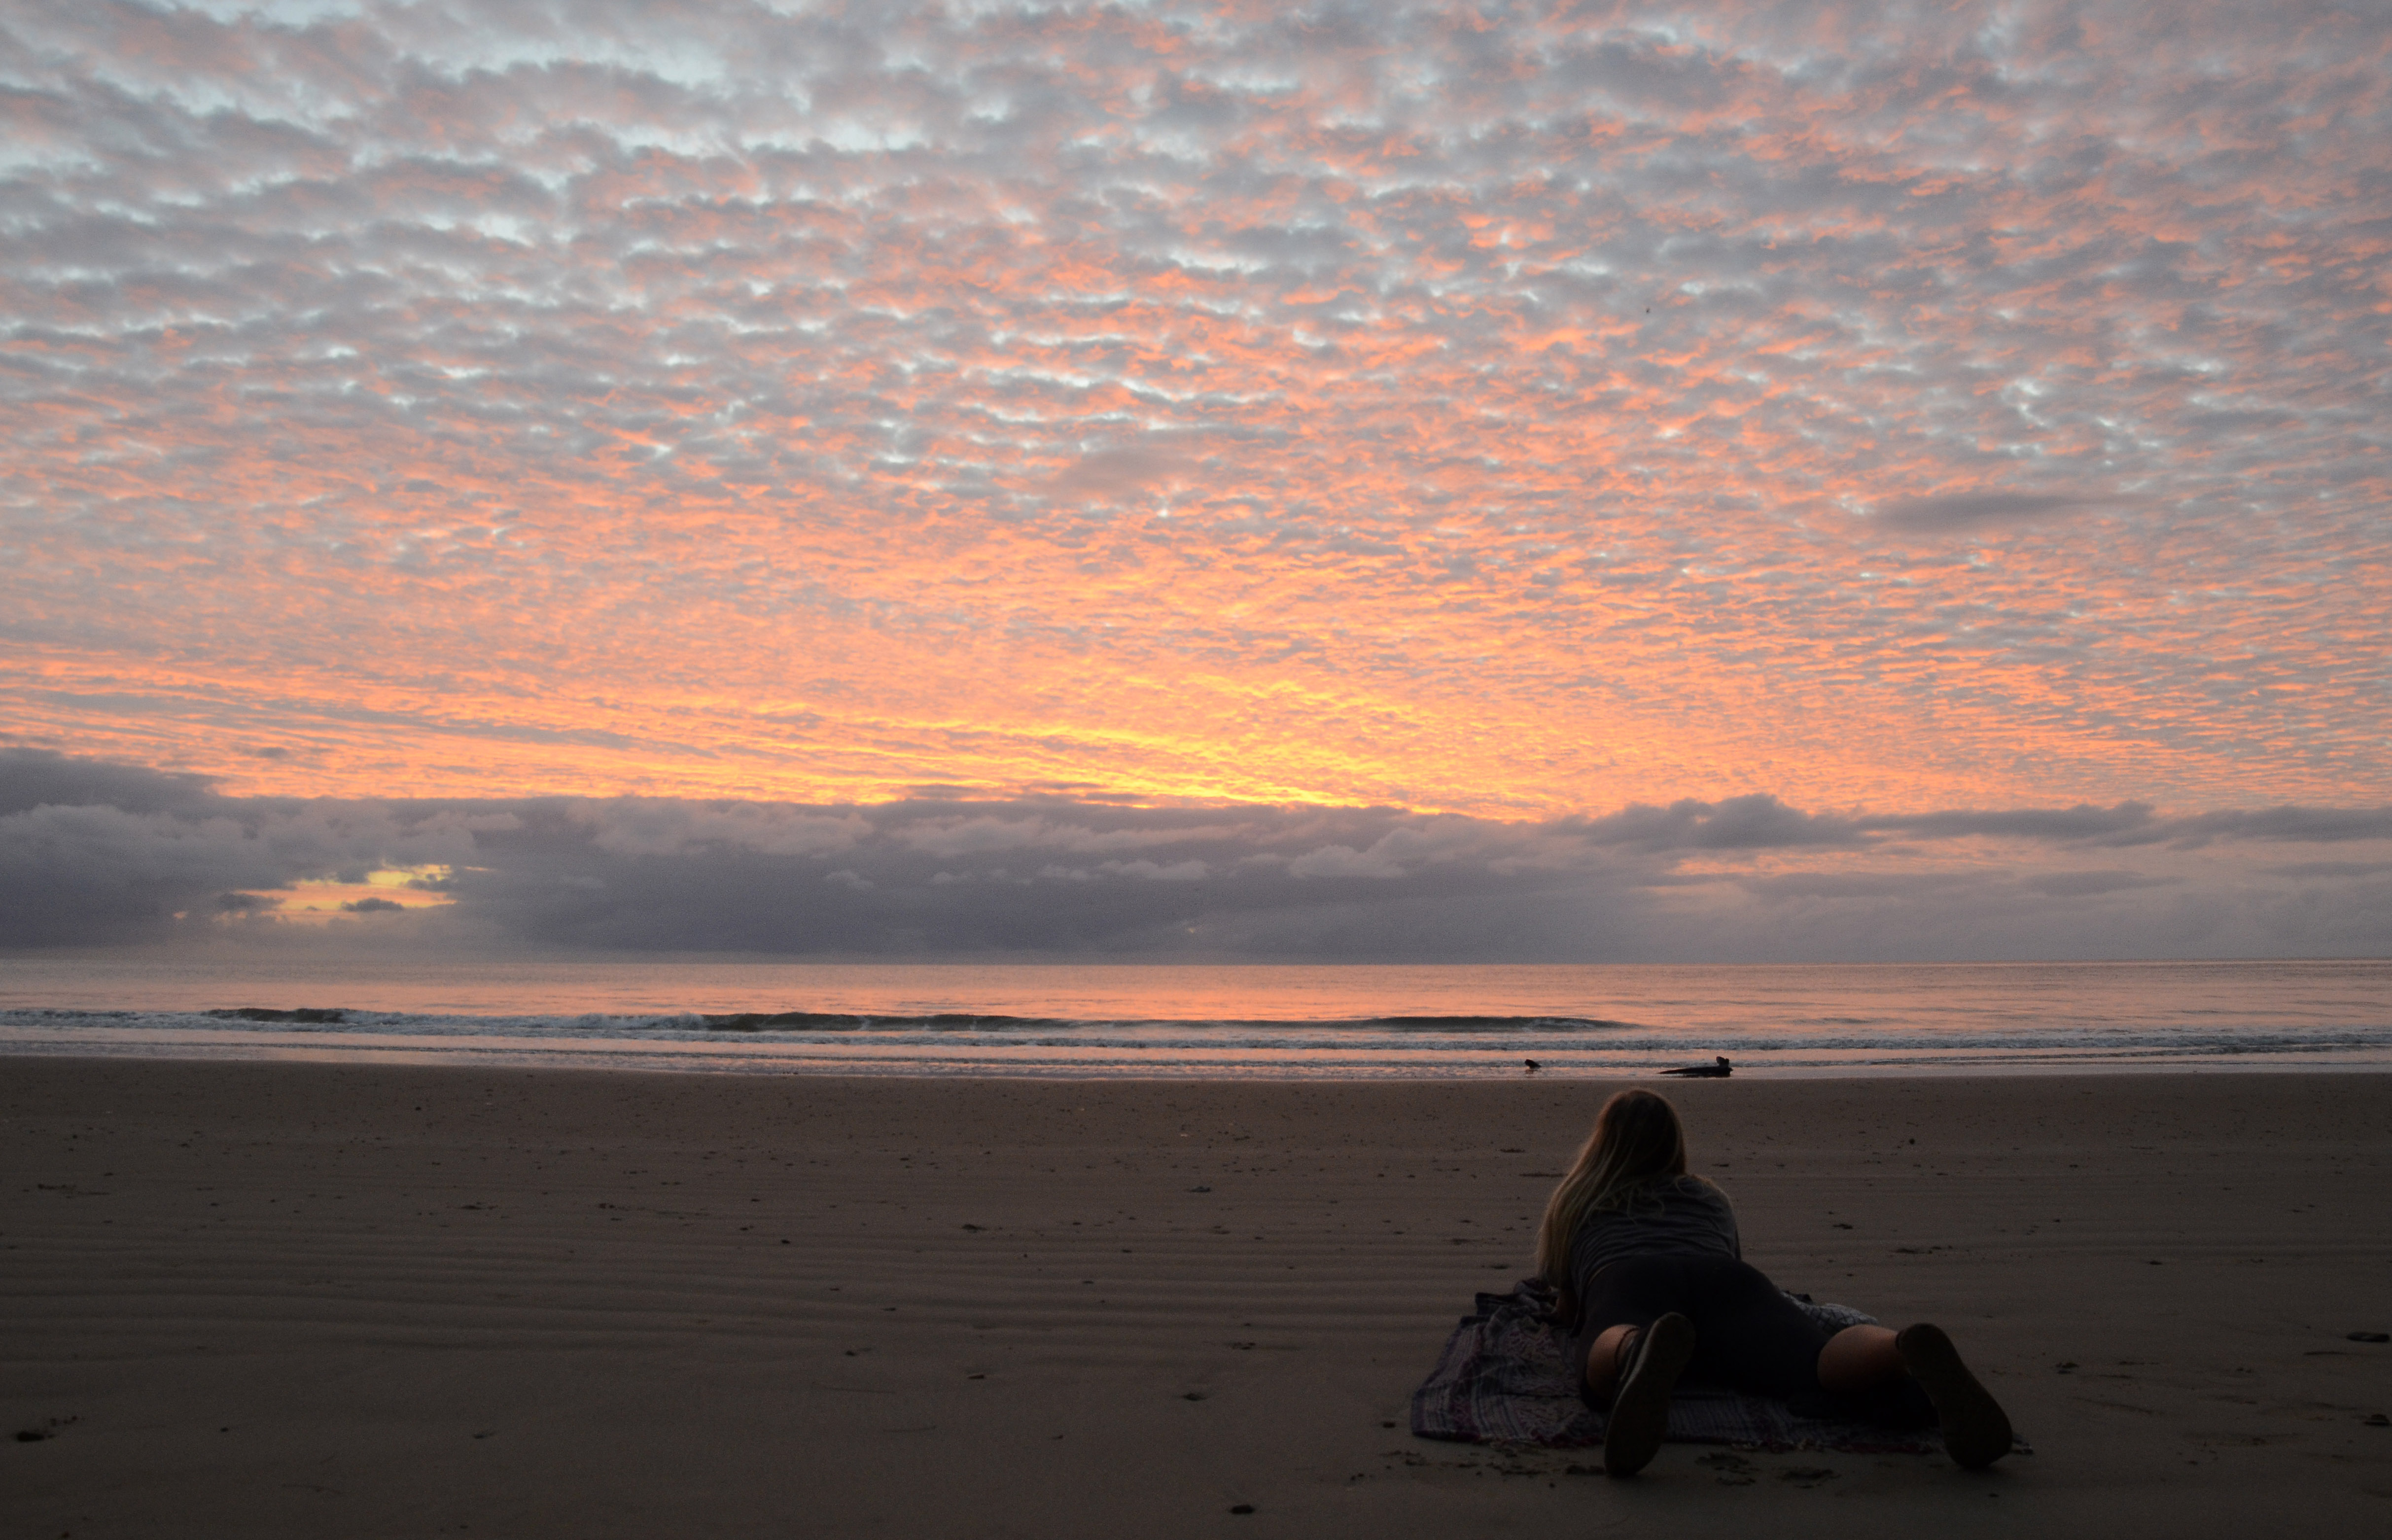 bright red sunrise on beach